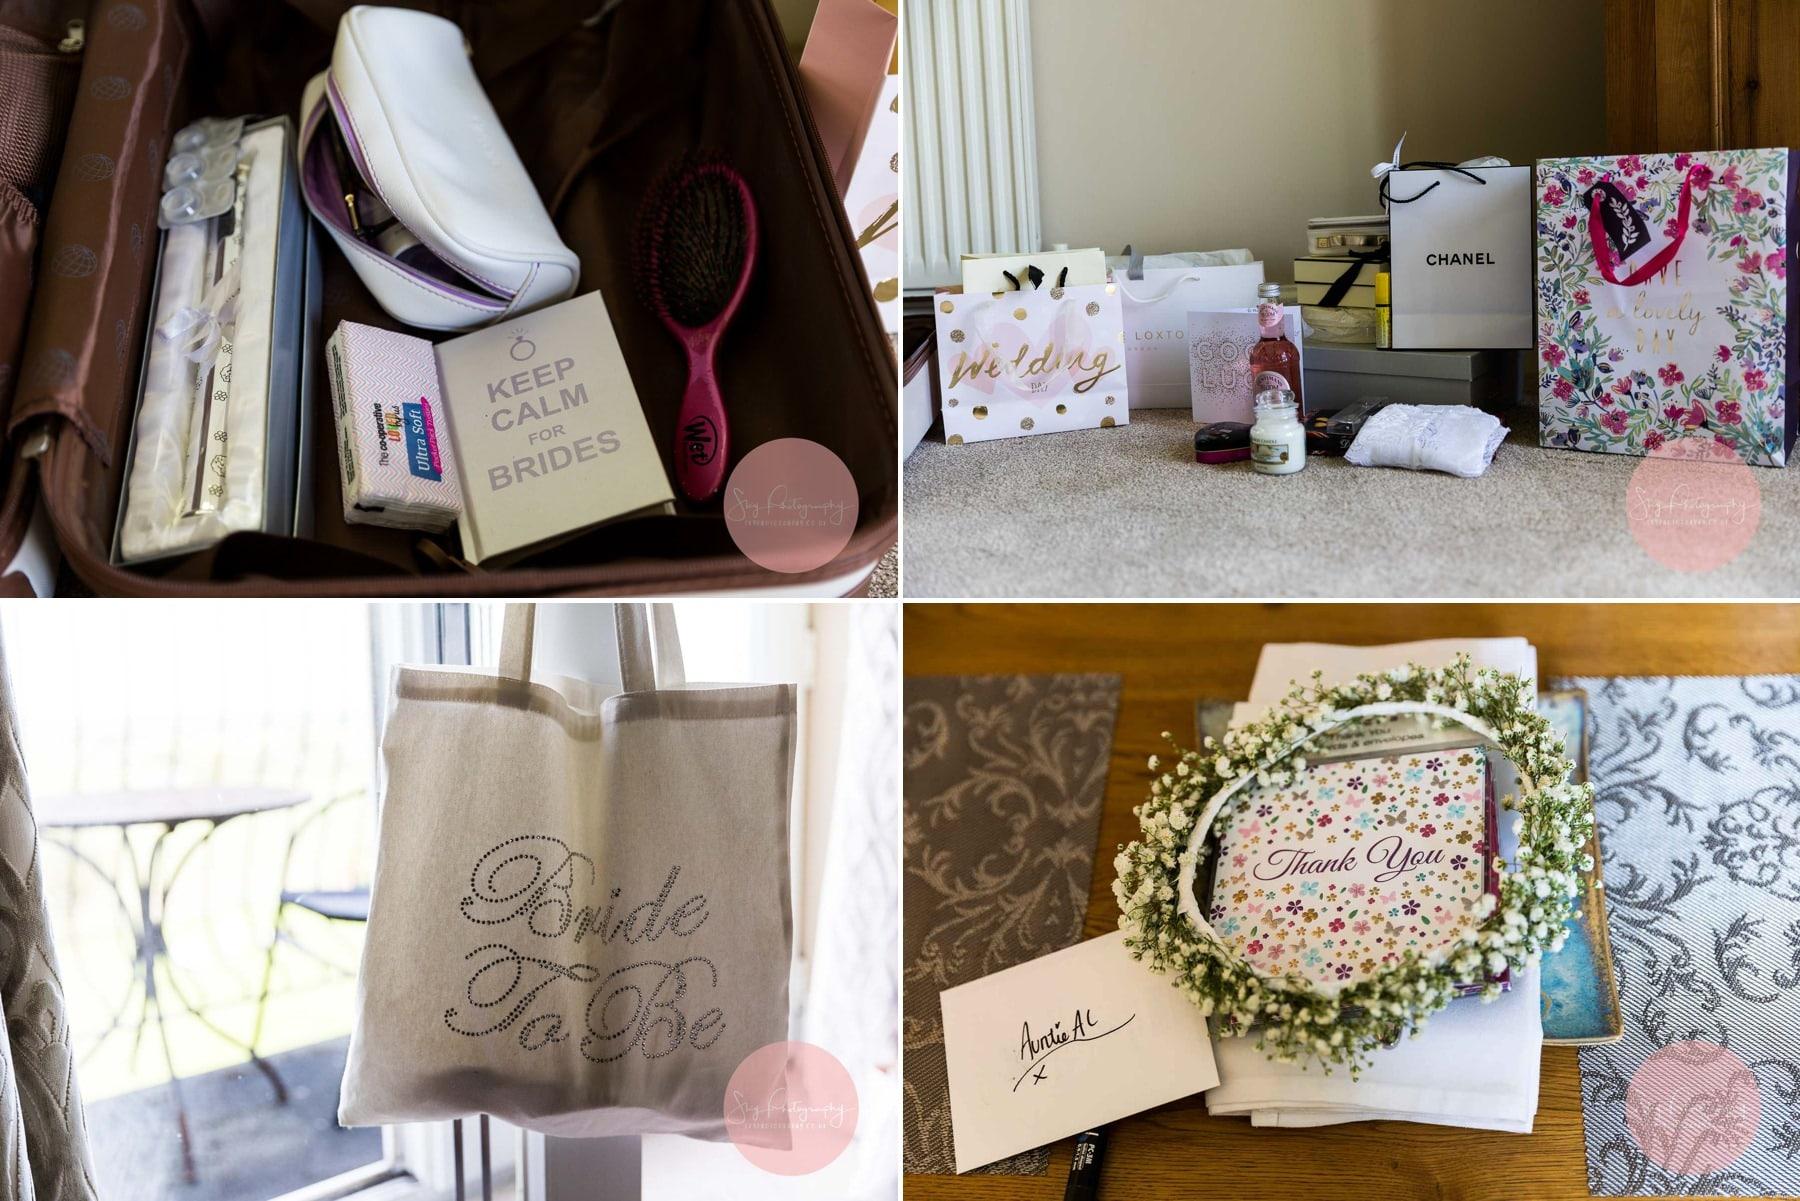 Brides accessories collage